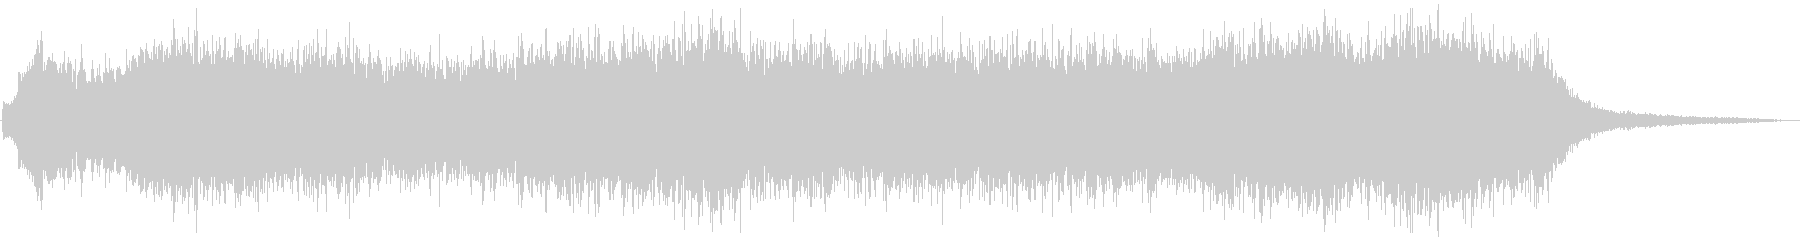 PADS エラティック01の未再生の波形